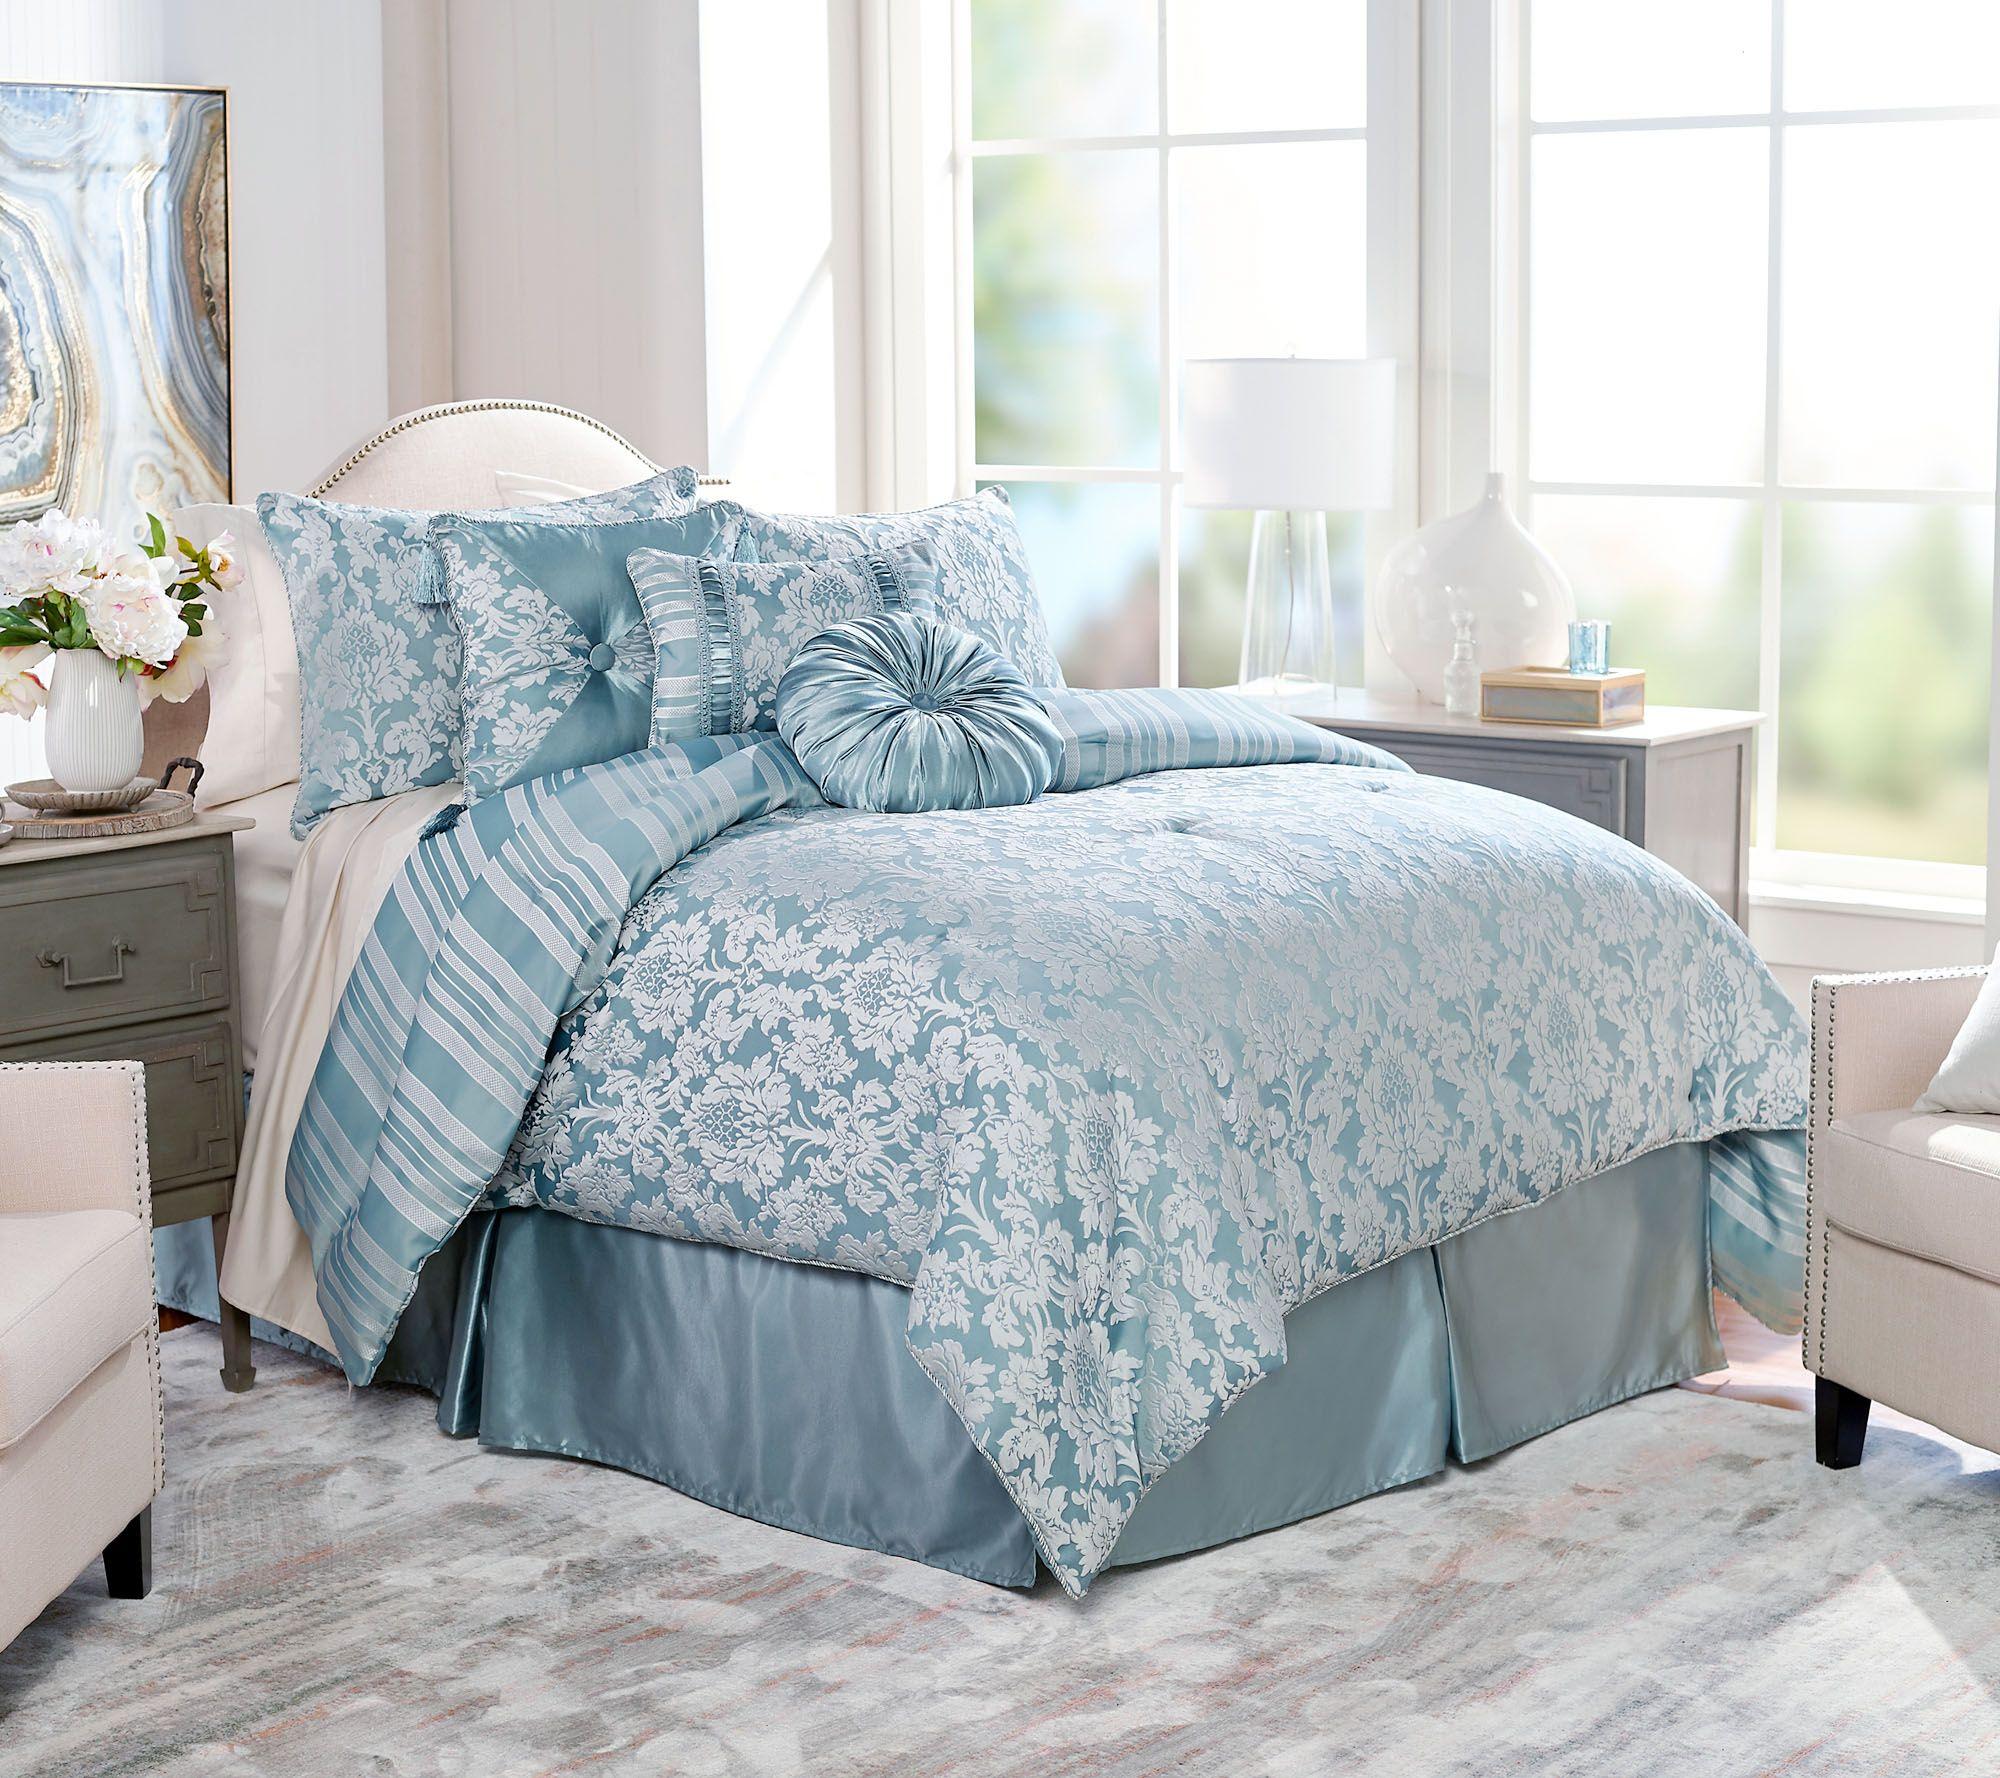 Northern Nights Jacquard Reversible 7-Piece King Comforter Set — QVC.com